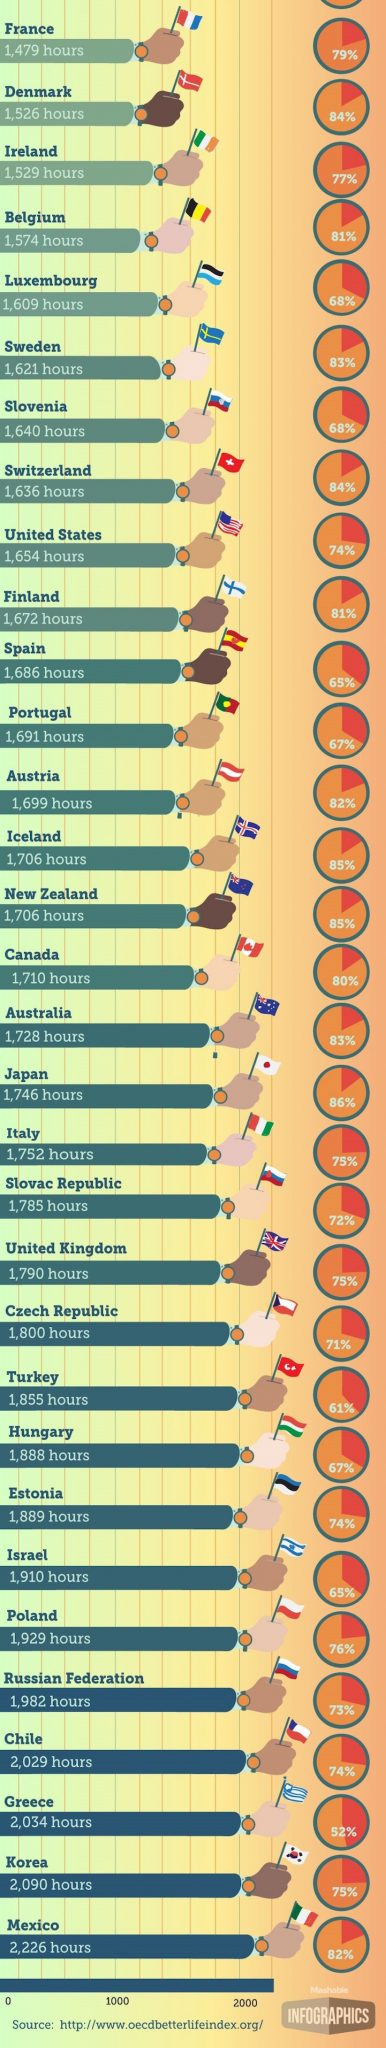 Eye-Opening-work-life-balance-countries-graphic (2)